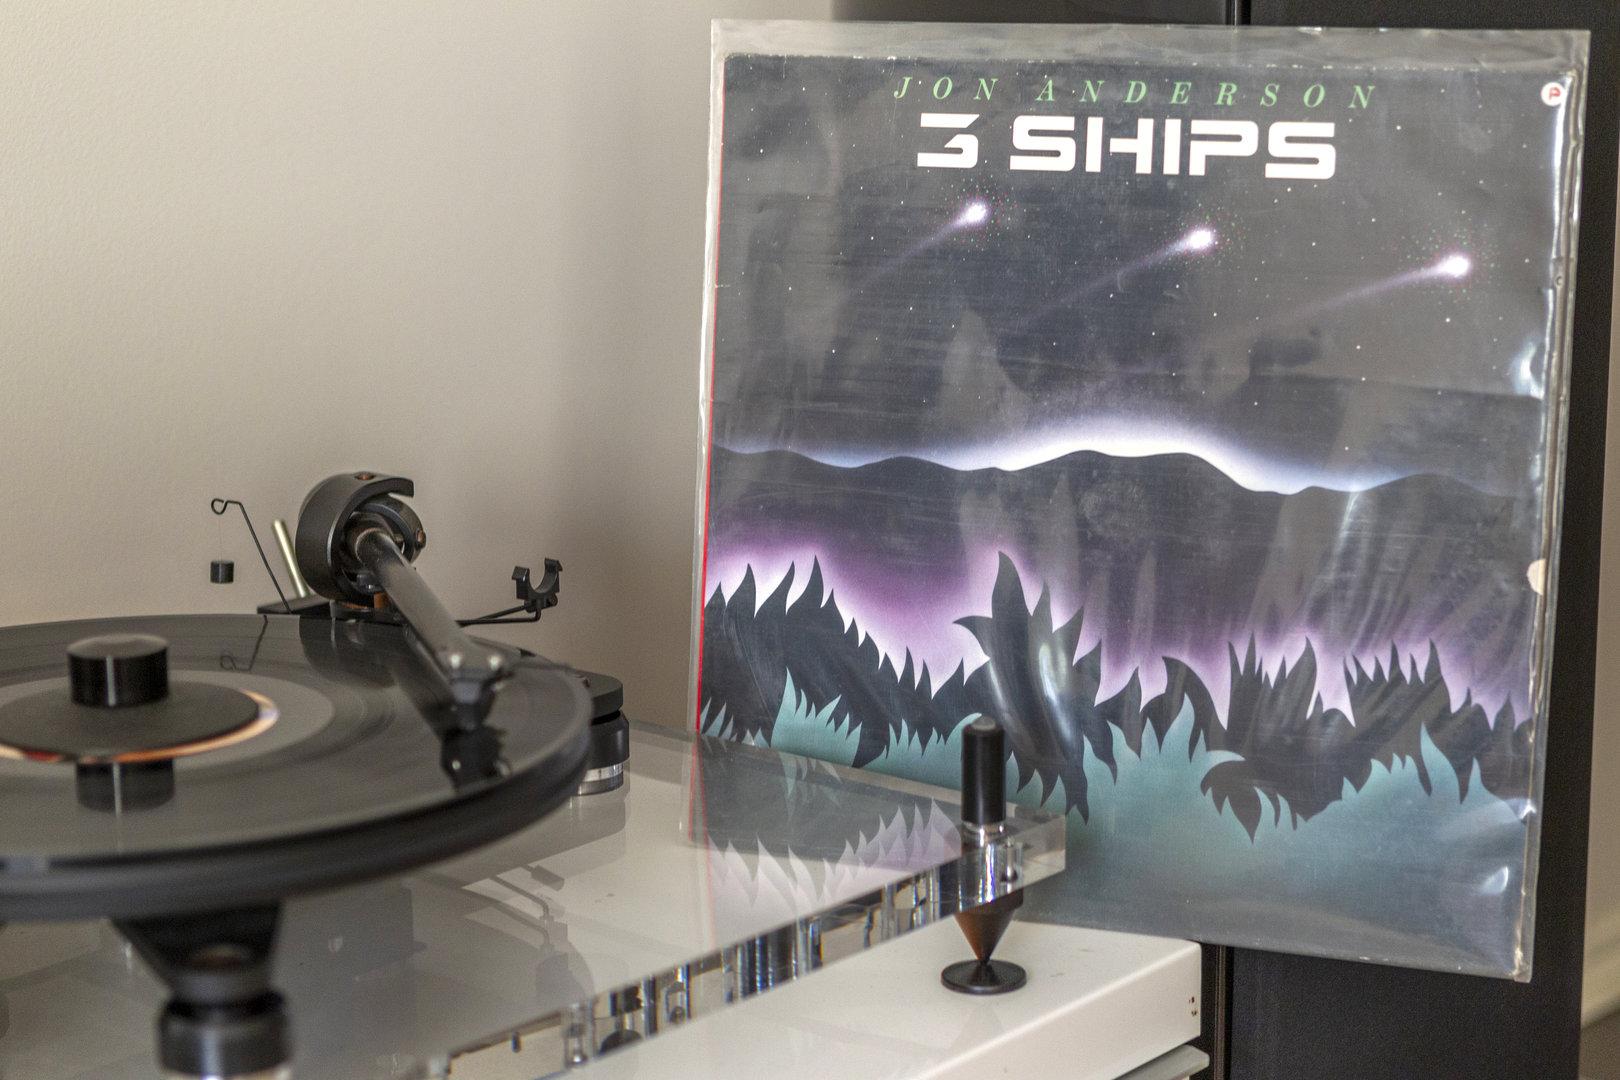 20210811 Jon Anderson - 3 Ships 1985.jpg